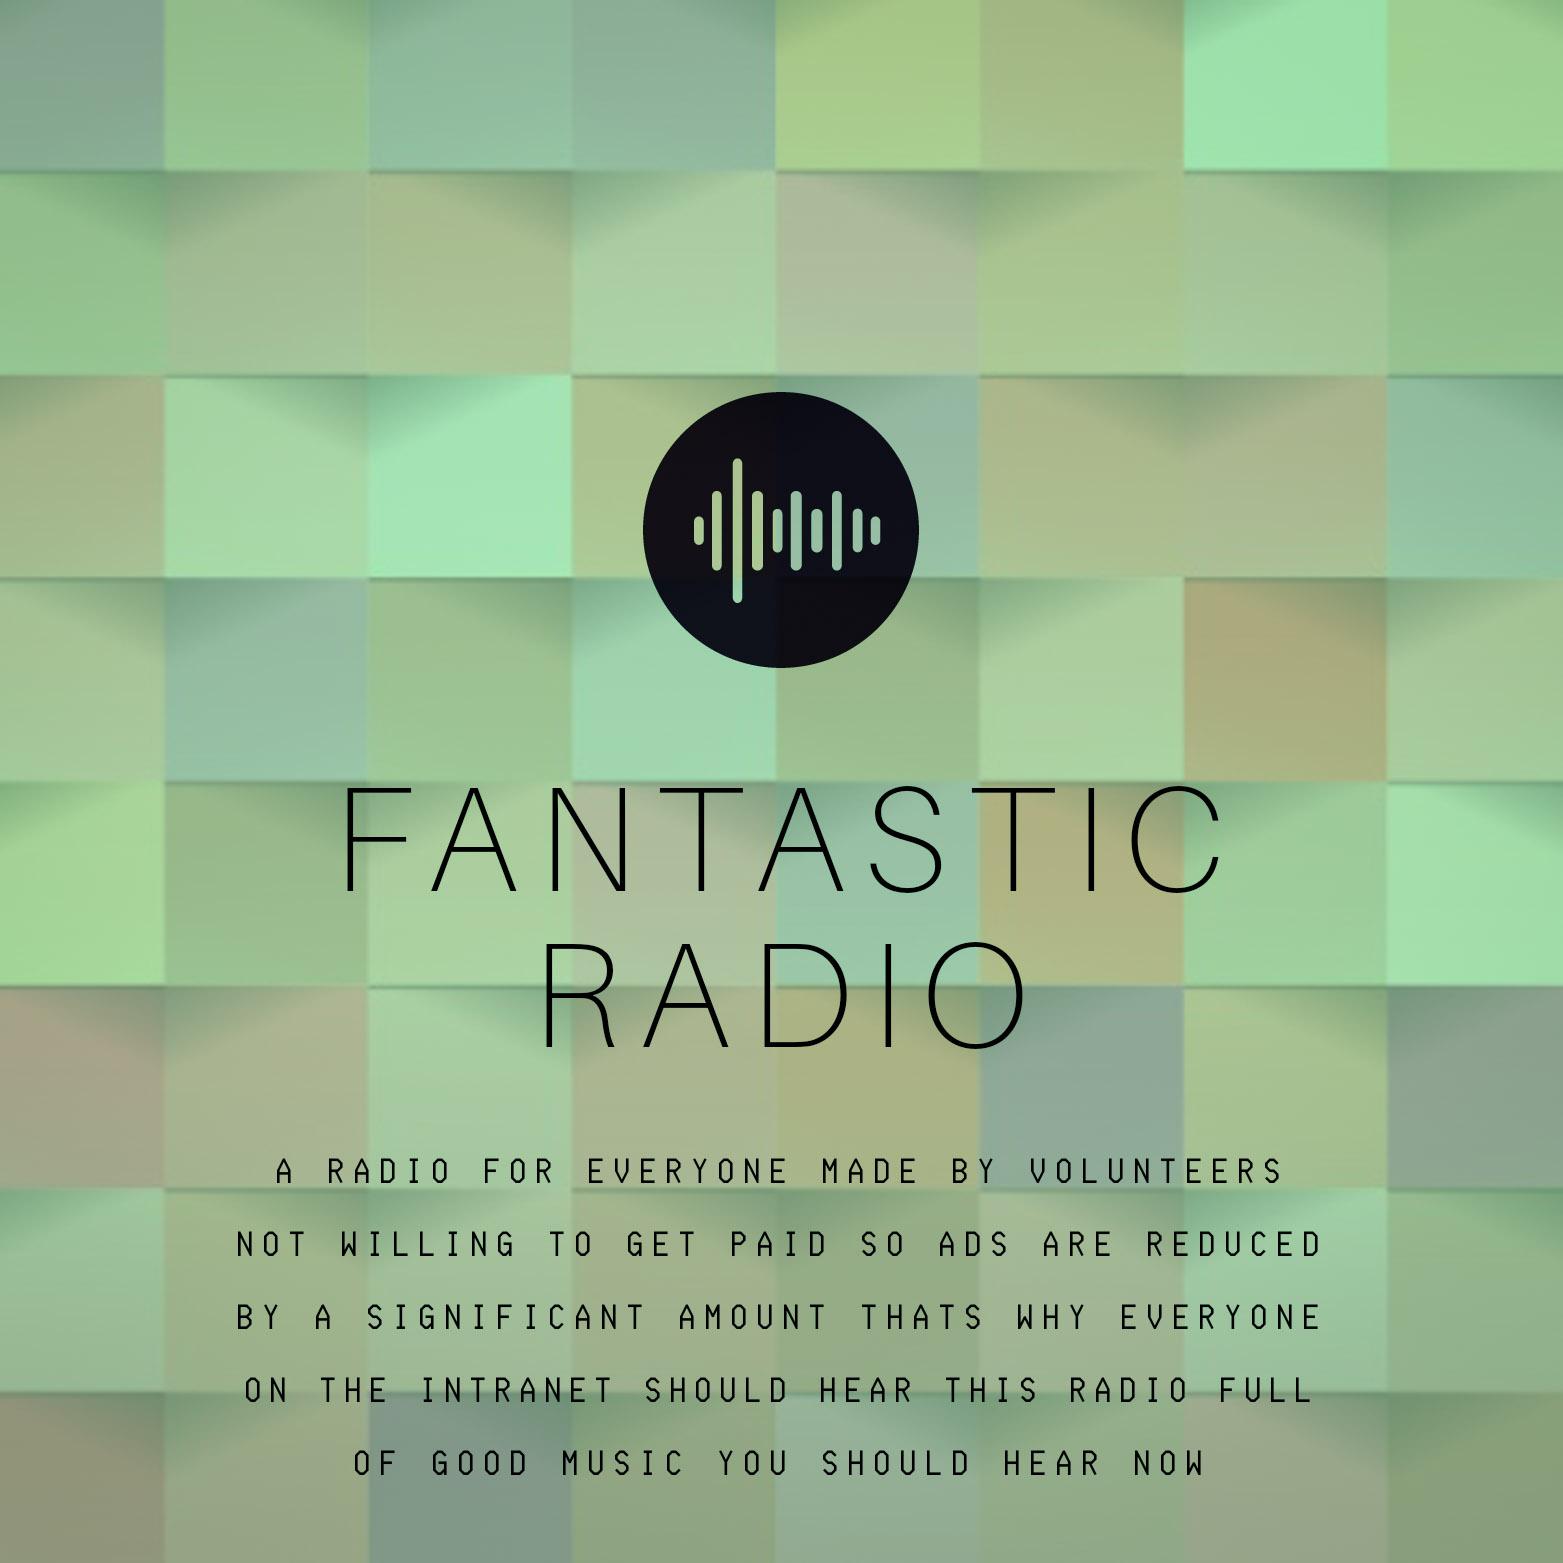 Fantastic Radio